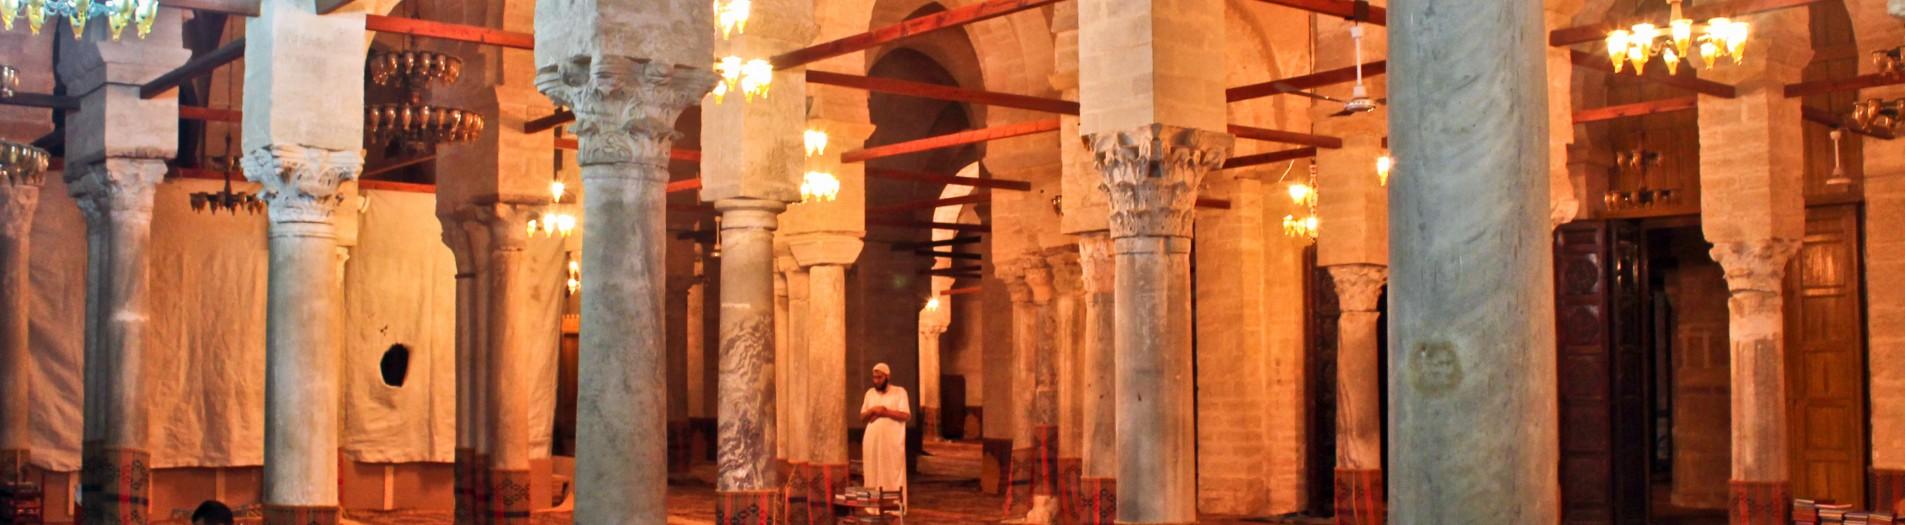 La grande mosquée de Sfax durant Ramadan